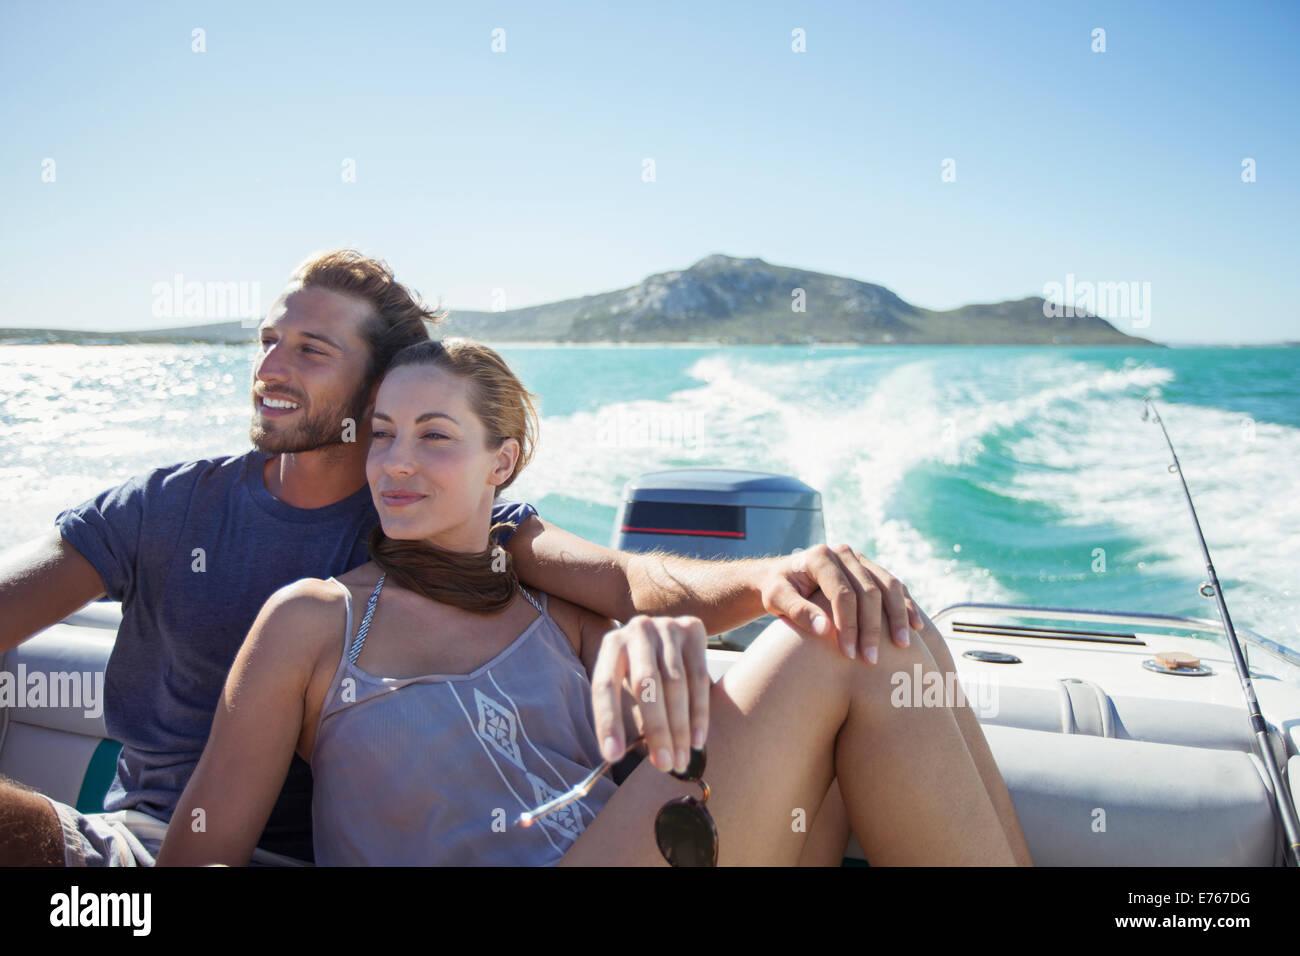 Couple sitting on boat together - Stock Image